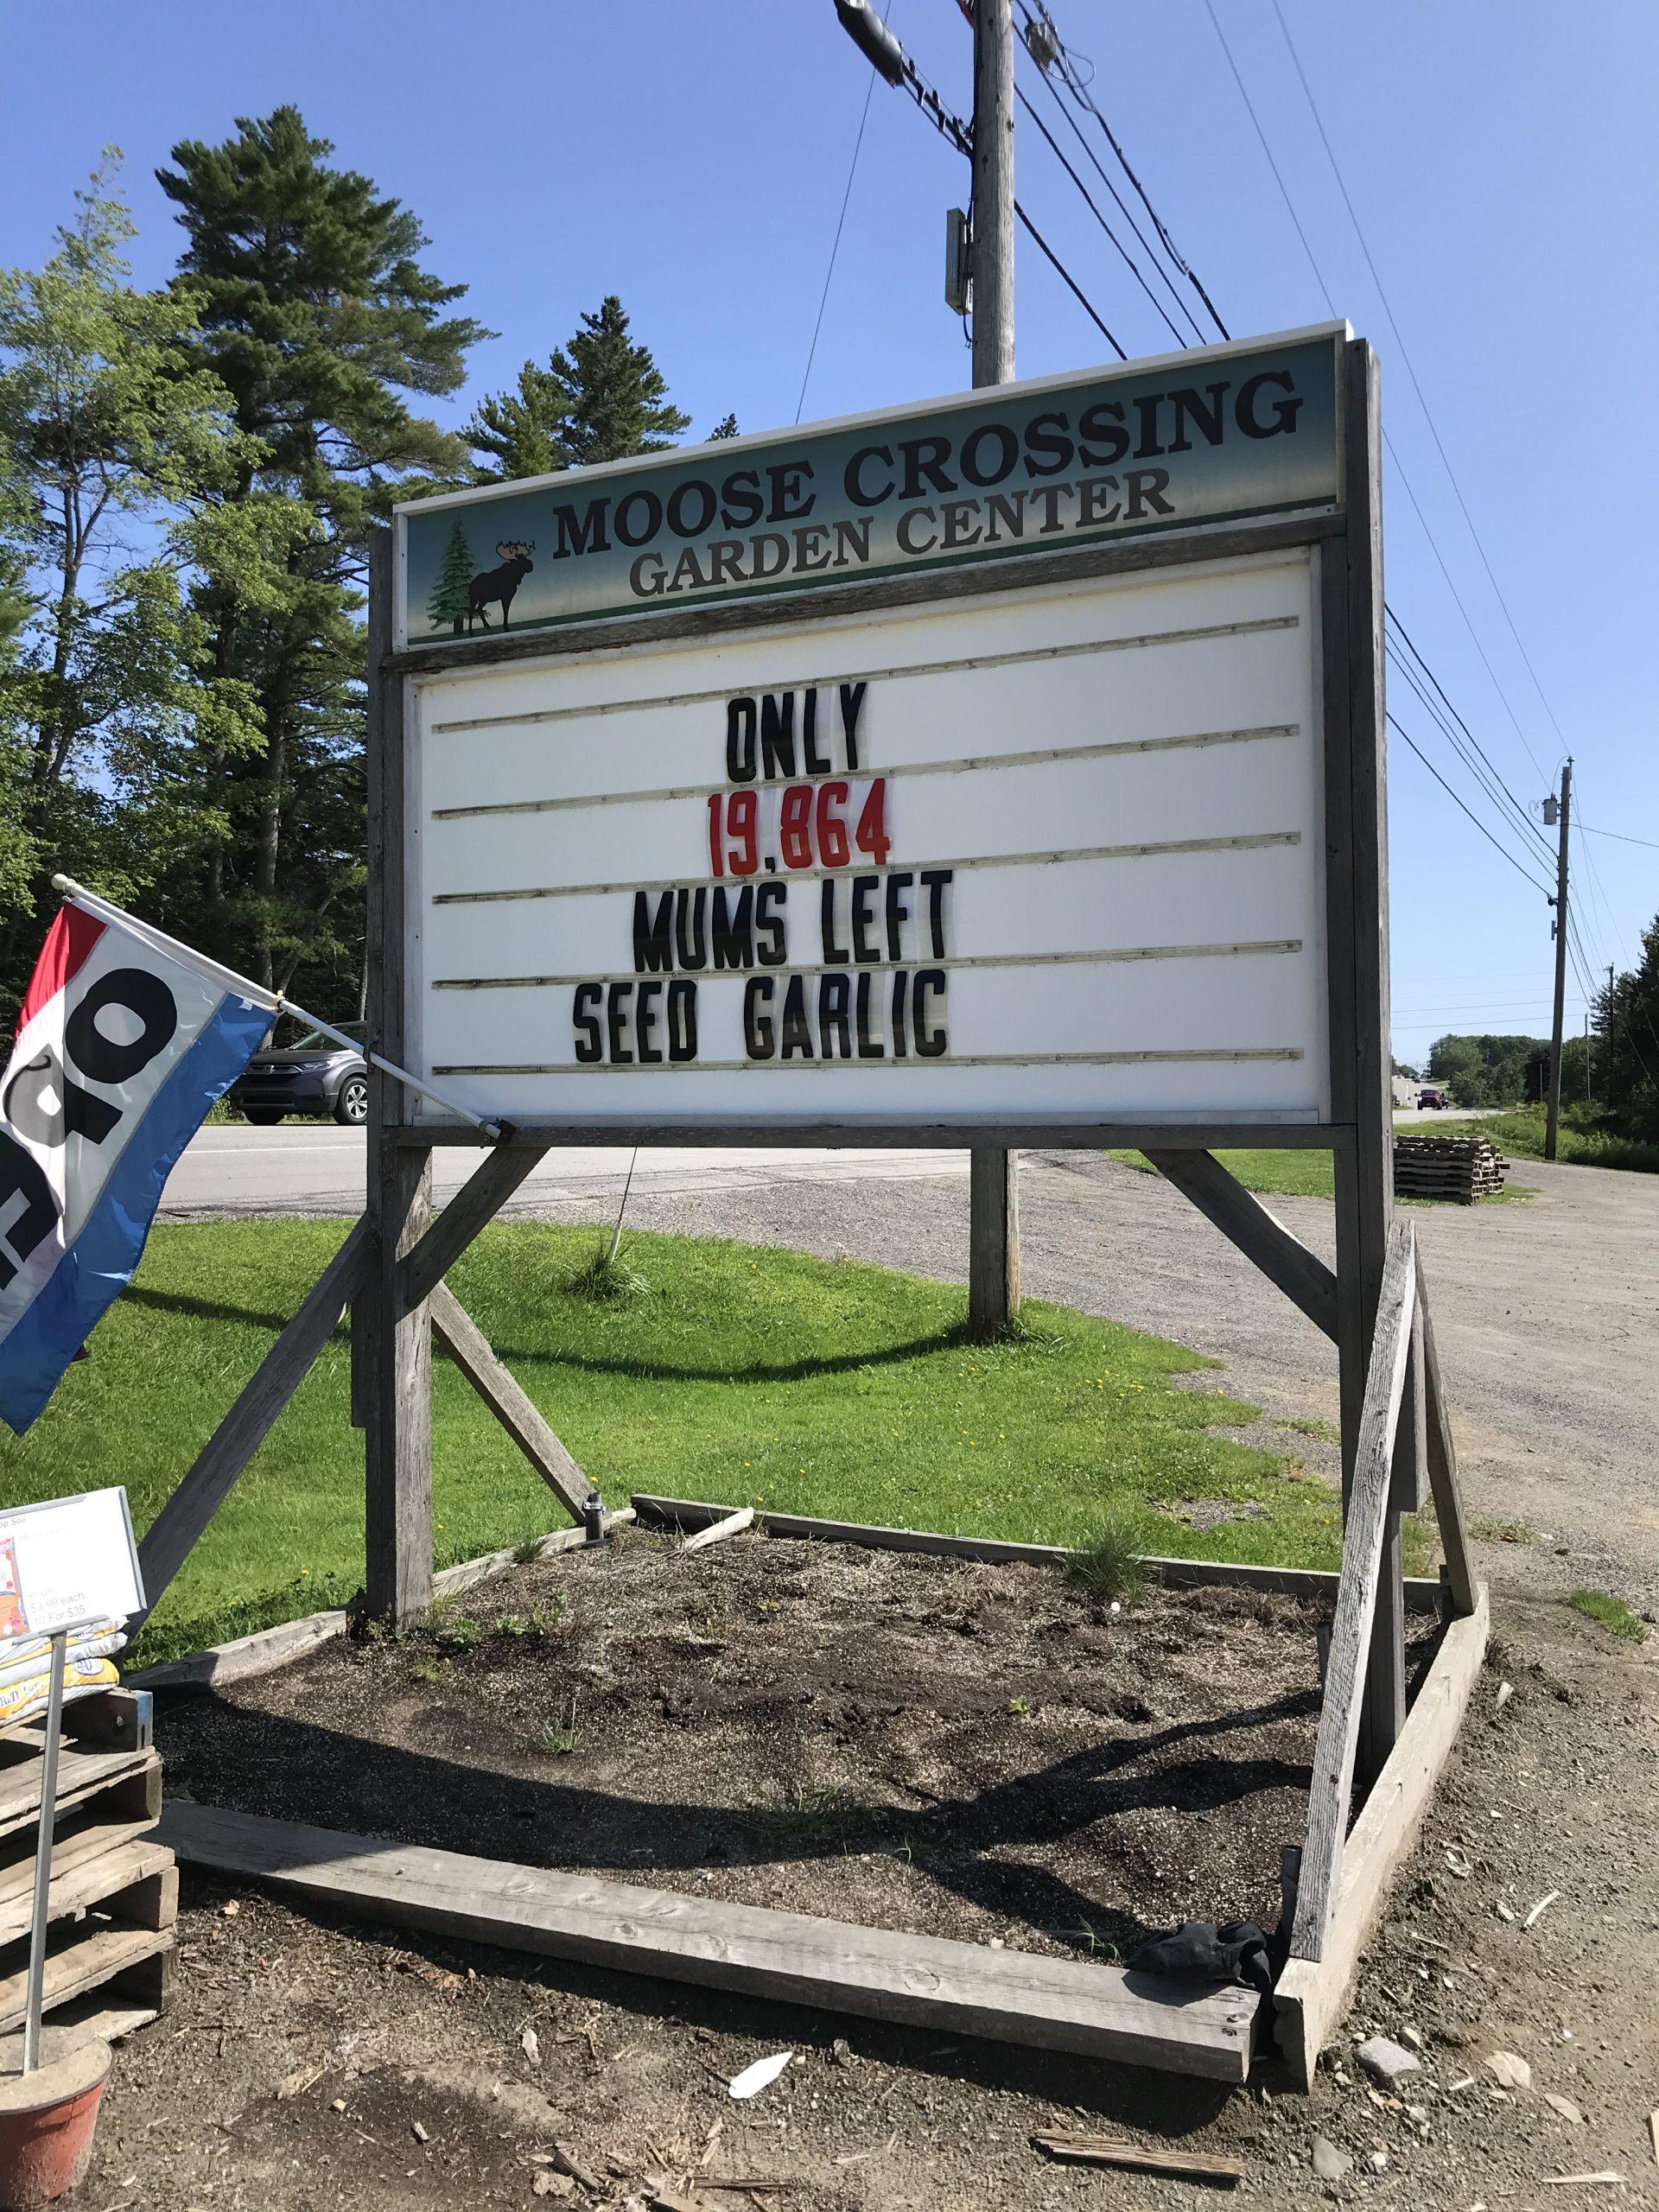 Moose Crossing Garden Center in Waldoboro, Maine